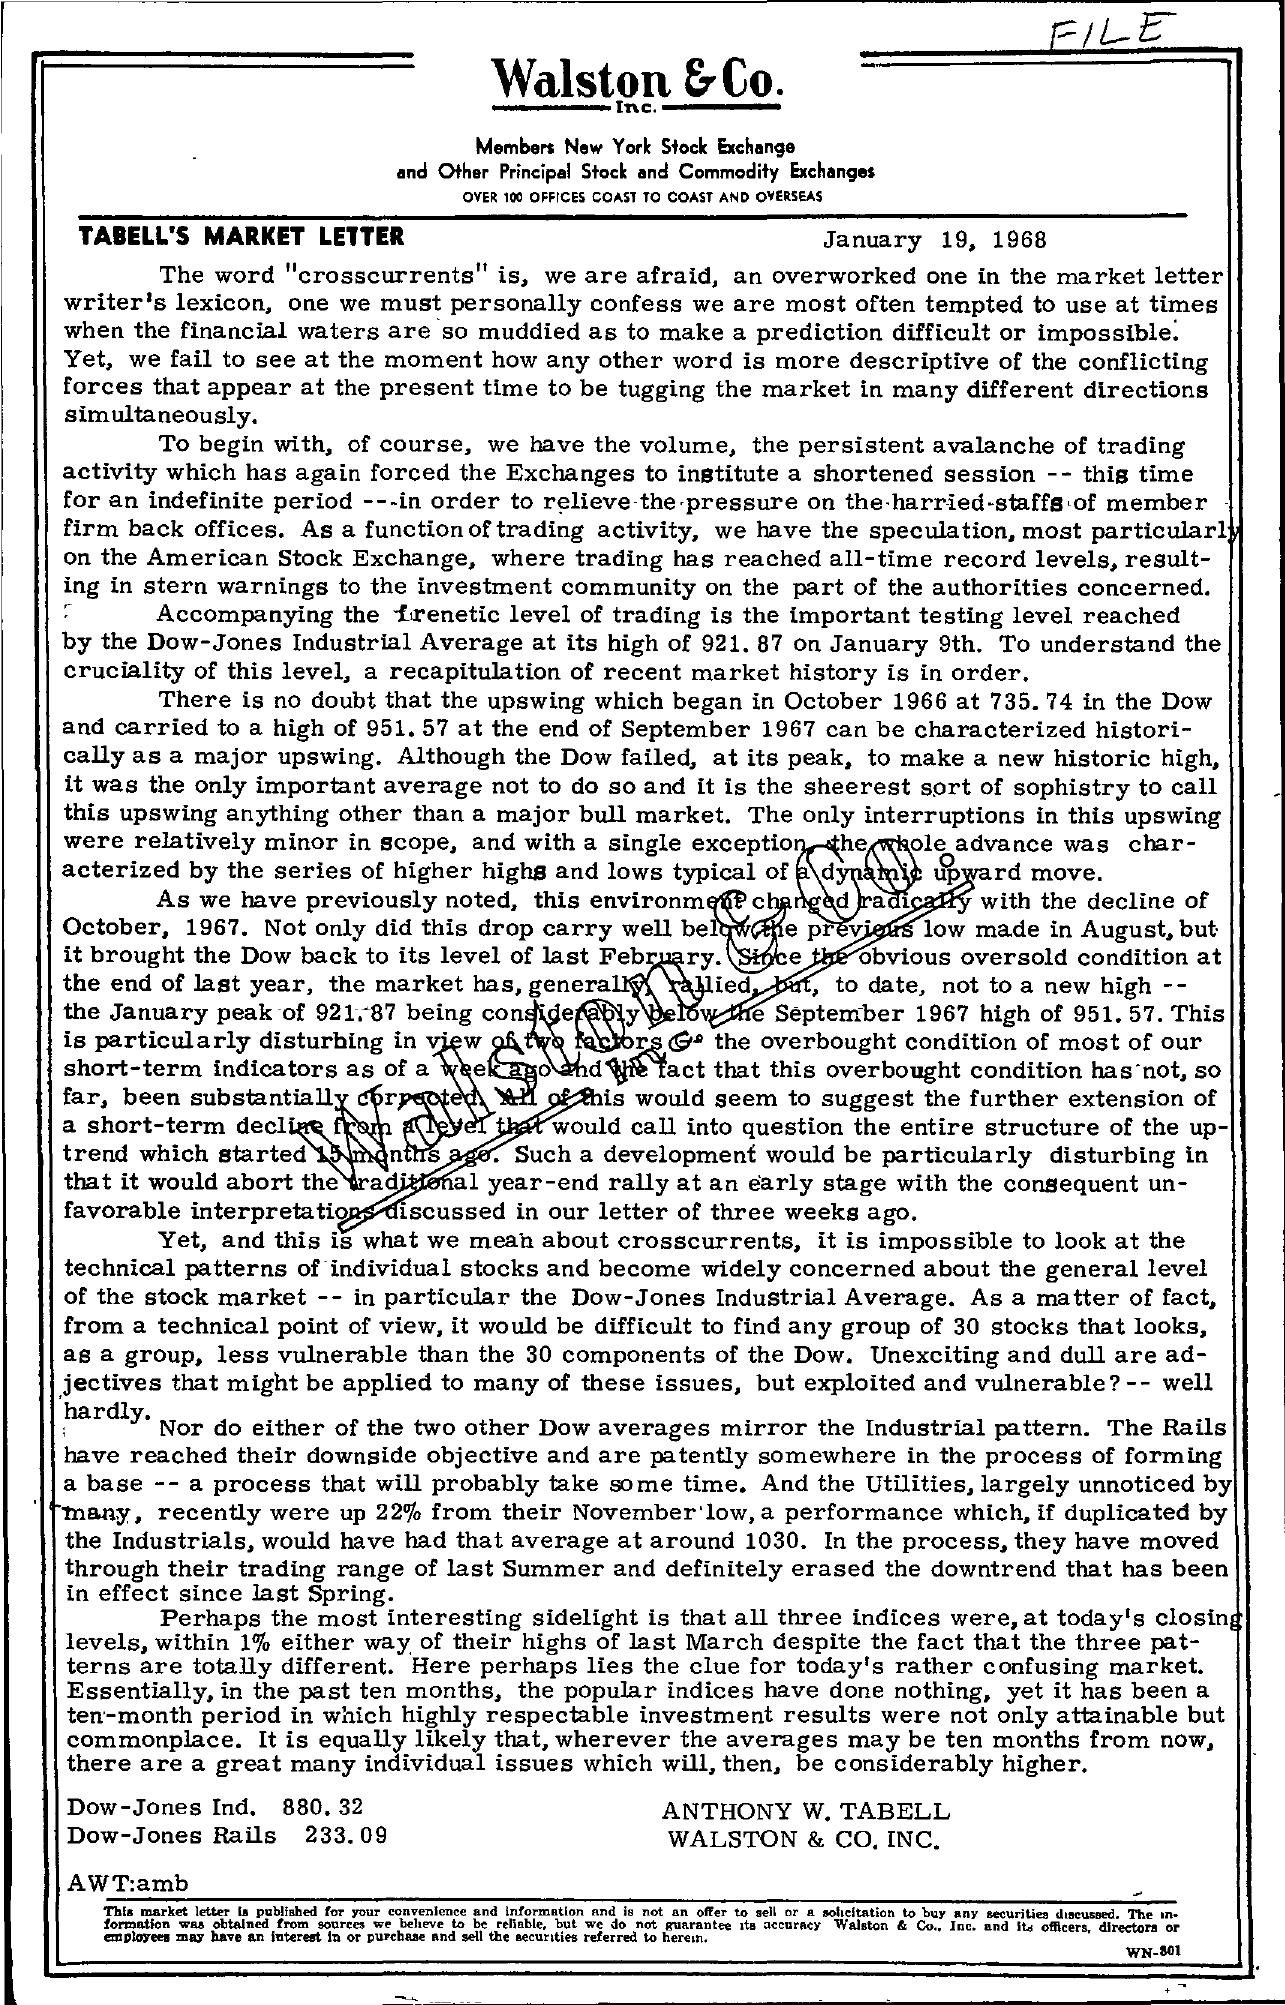 Tabell's Market Letter - January 19, 1968